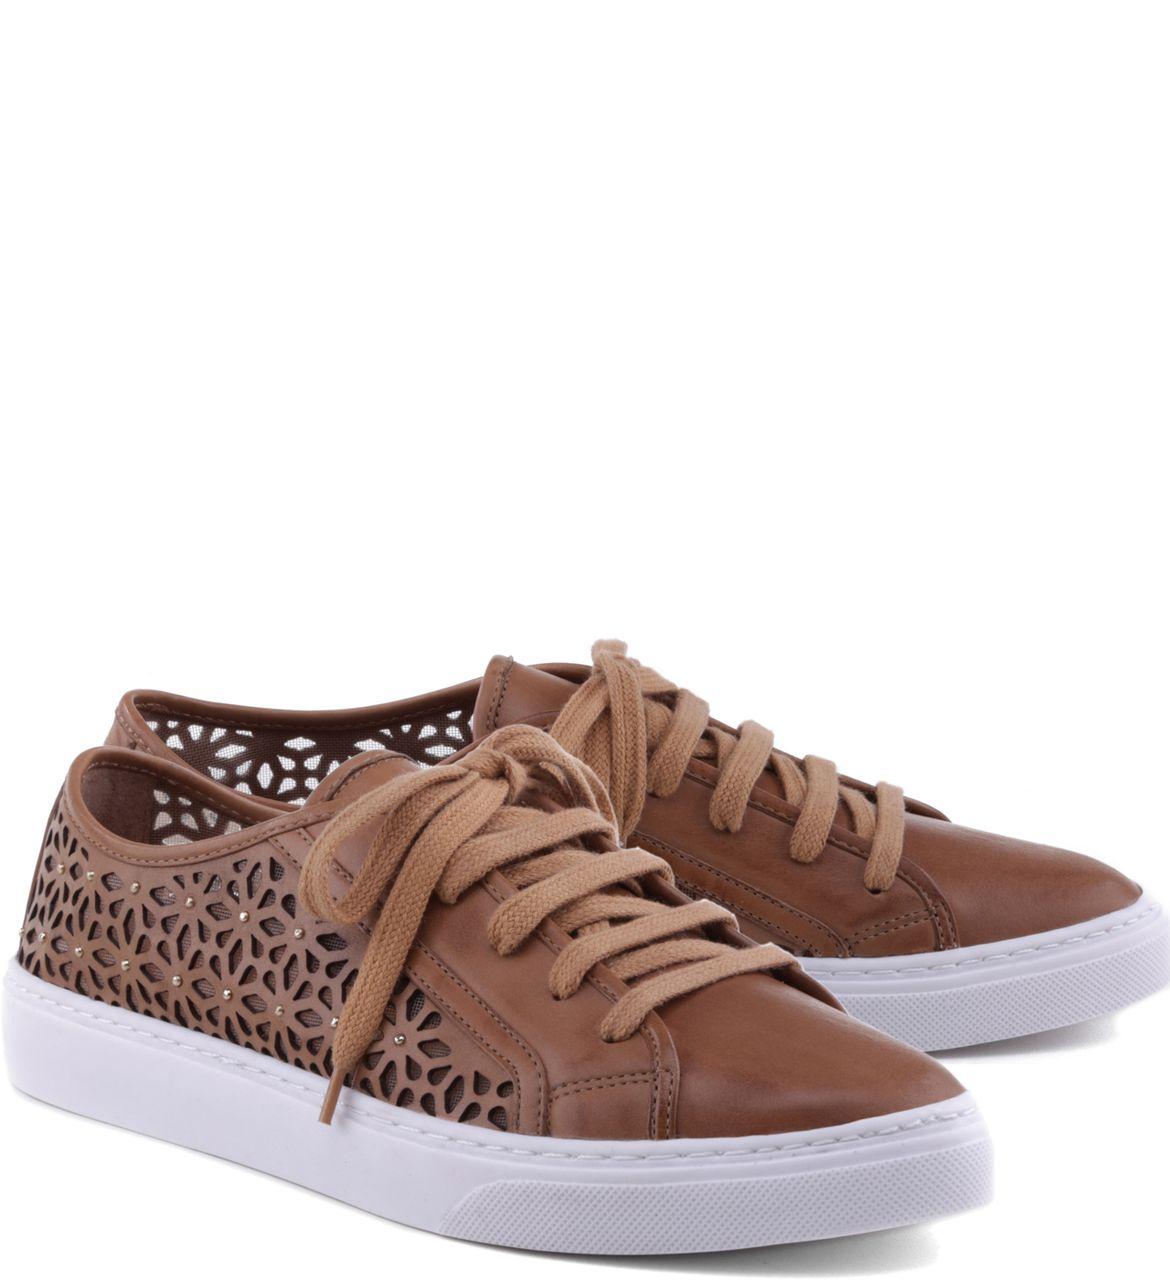 Buy Shoes Sydney